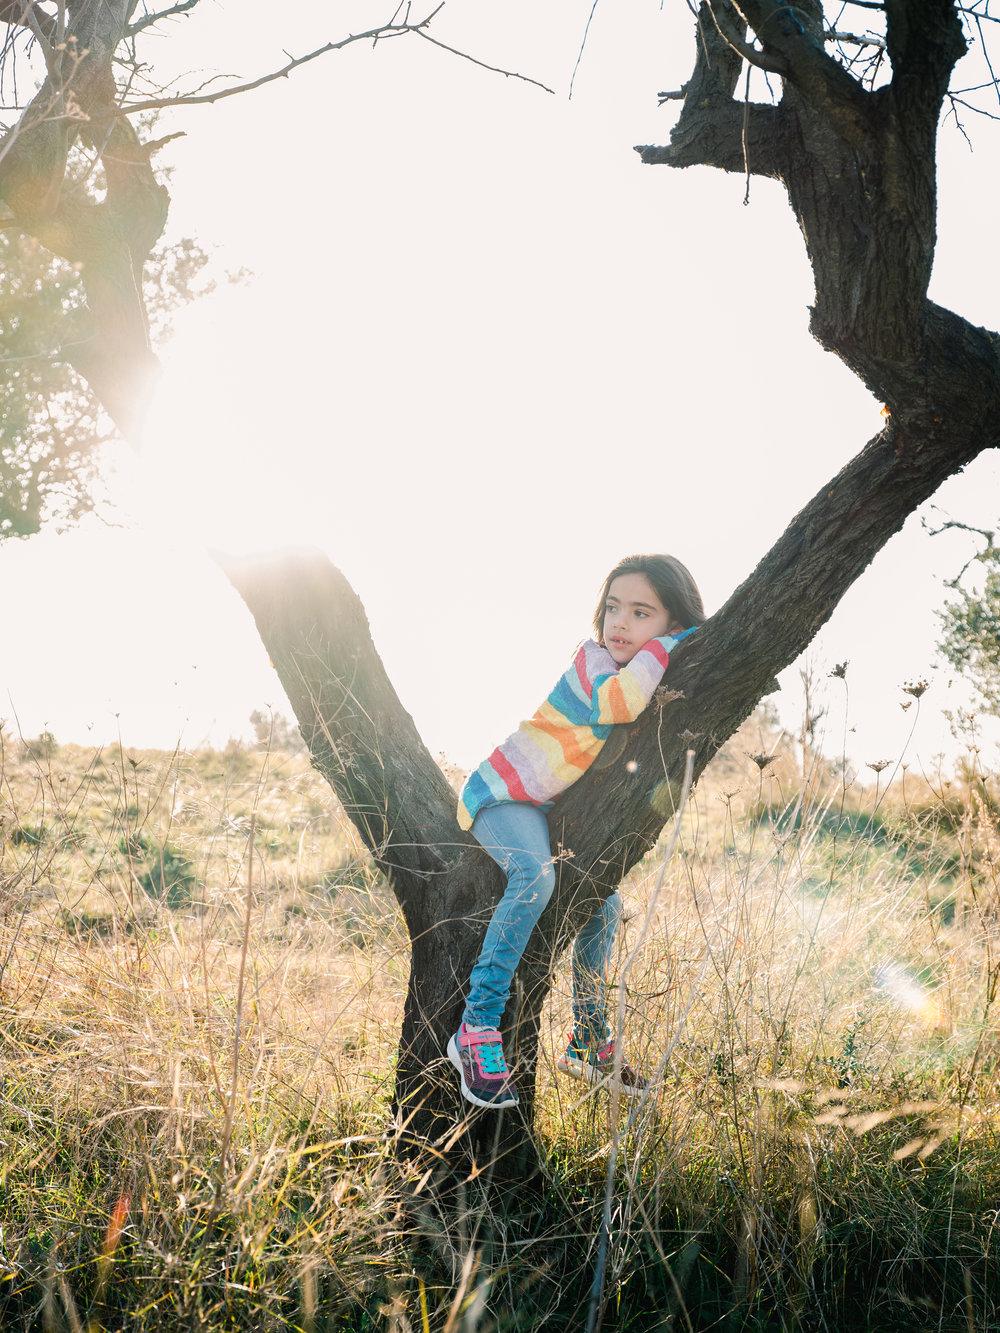 fotografia-infantil-familiar04.jpg